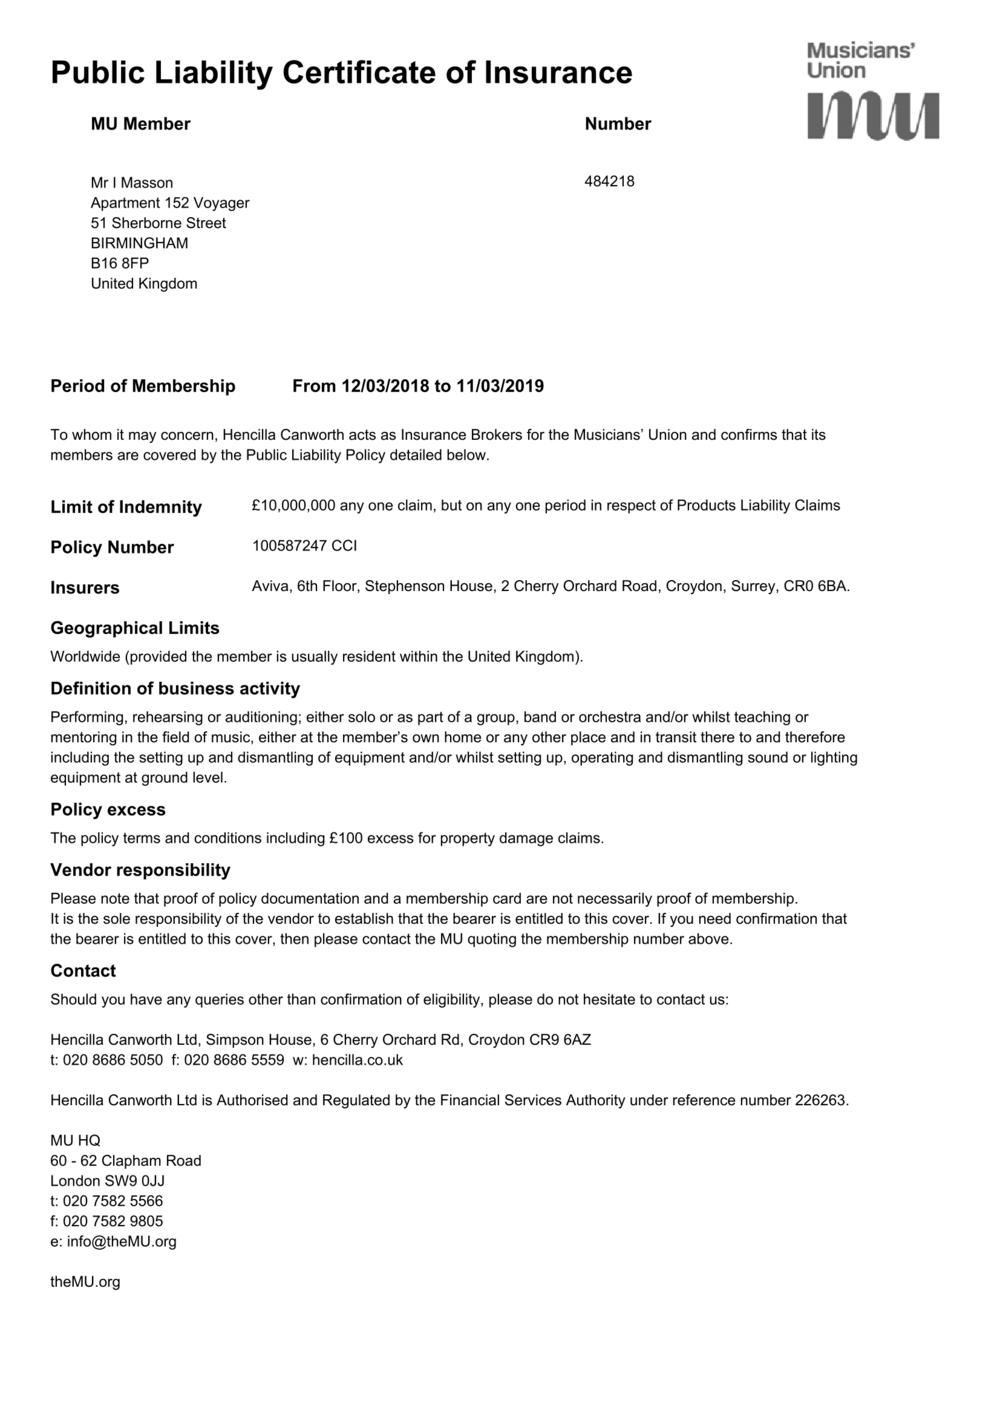 PLI Certificate_ Iain Masson.png